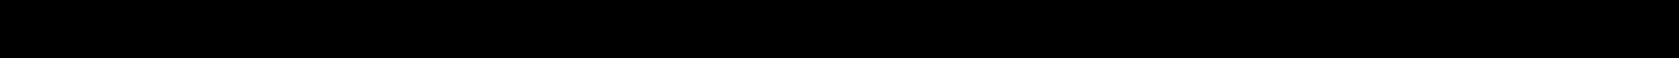 {\displaystyle {\text{RestorationManipulator}}={\Big (}1-(1-Amplification_{1})\times (1-Amplification_{2})\times \dots {\Big )}-{\Big (}1-(1-Reduction_{1})\times (1-Reduction_{2})\times \dots {\Big )}}